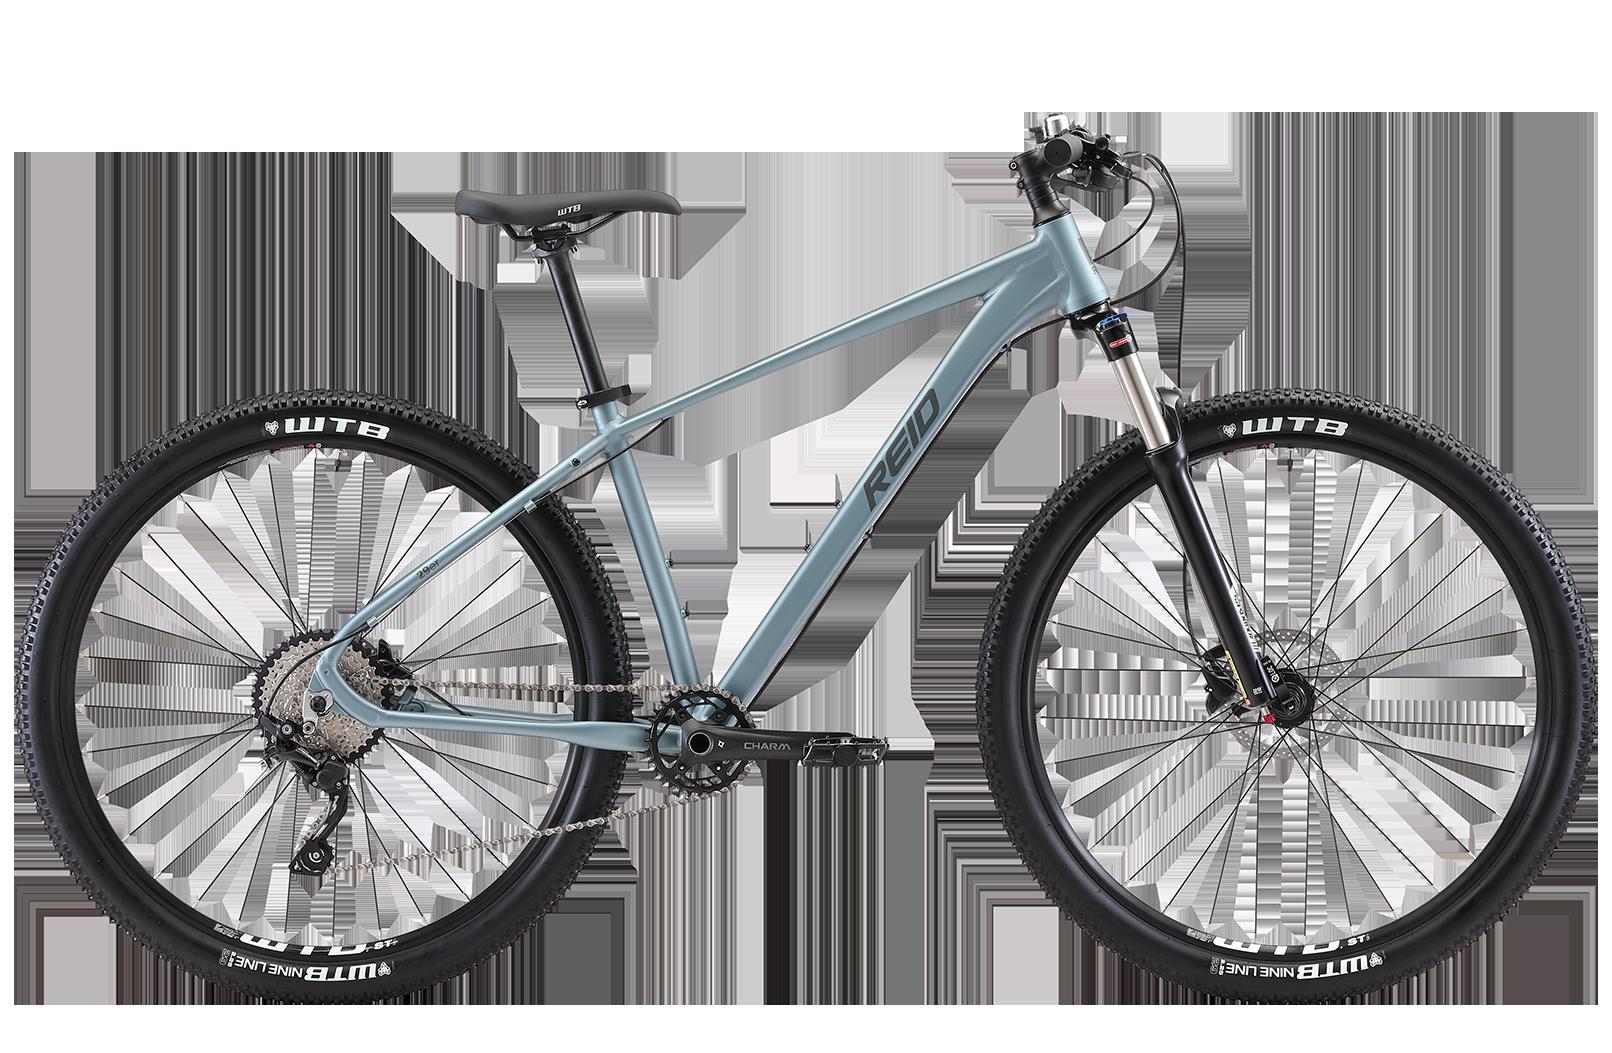 IMG 0120 ¦¦ 1 - Reid ® - Argon Bike